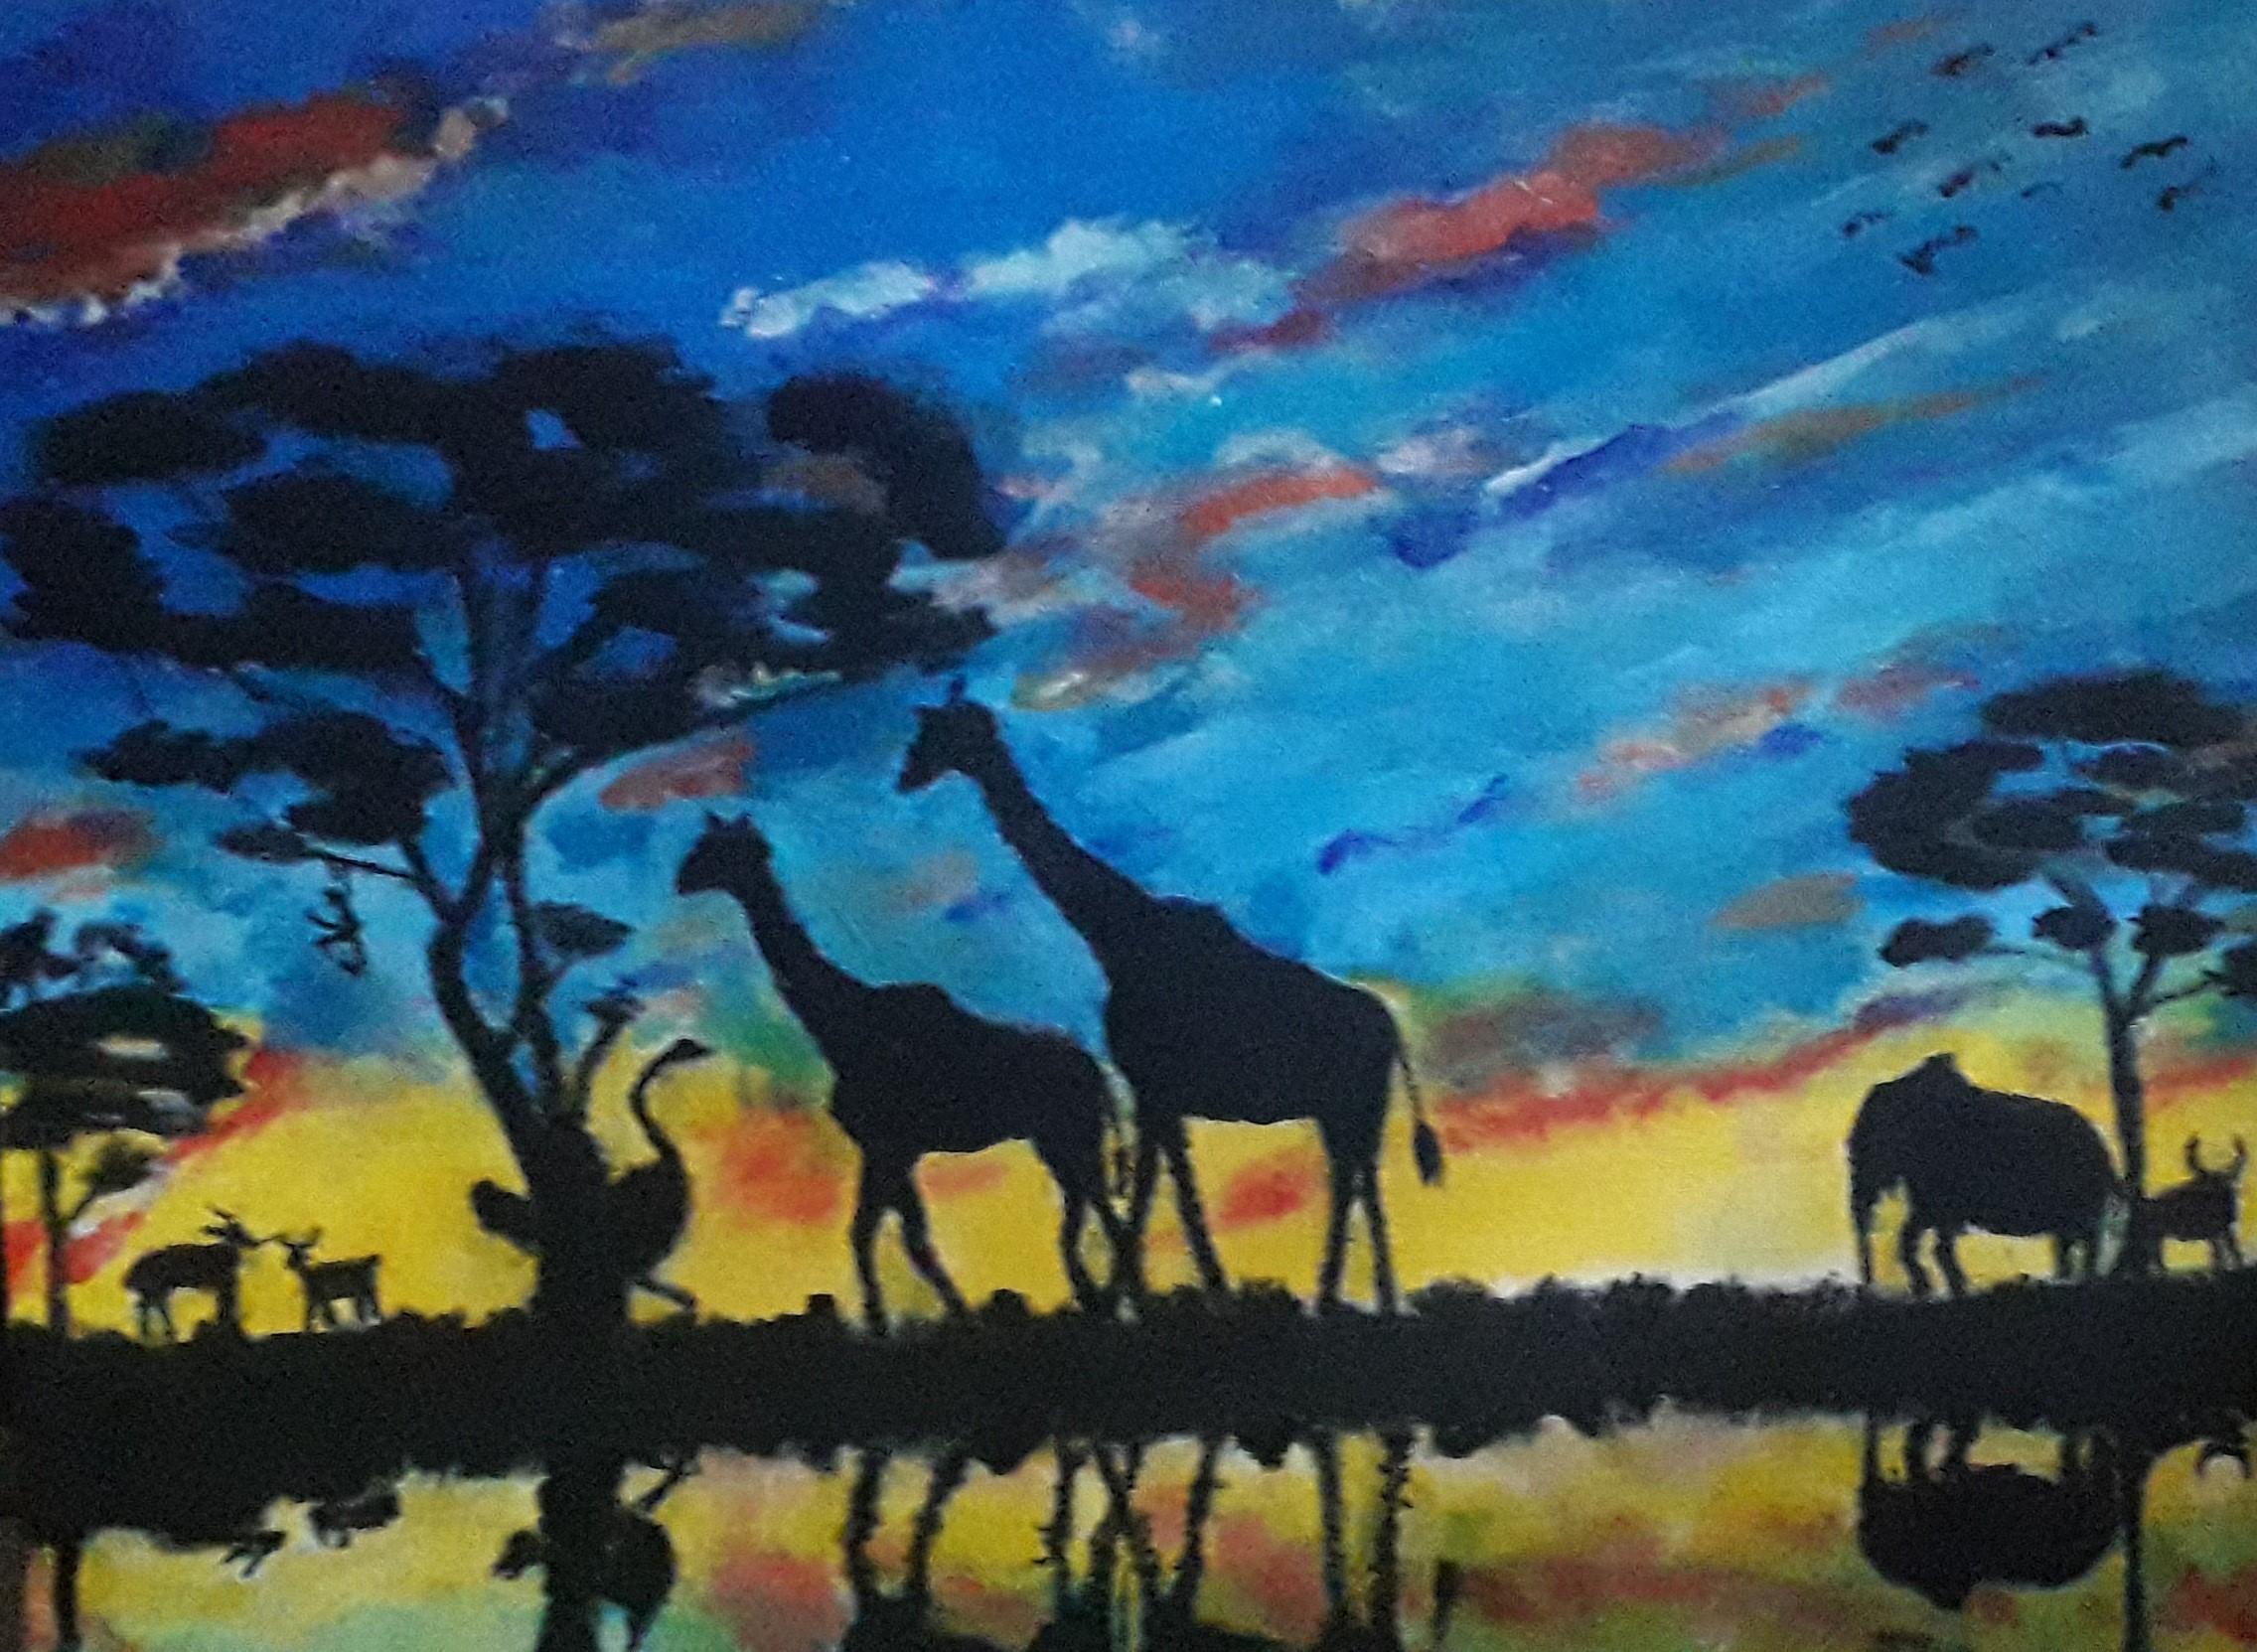 Wild Life by Simpson David